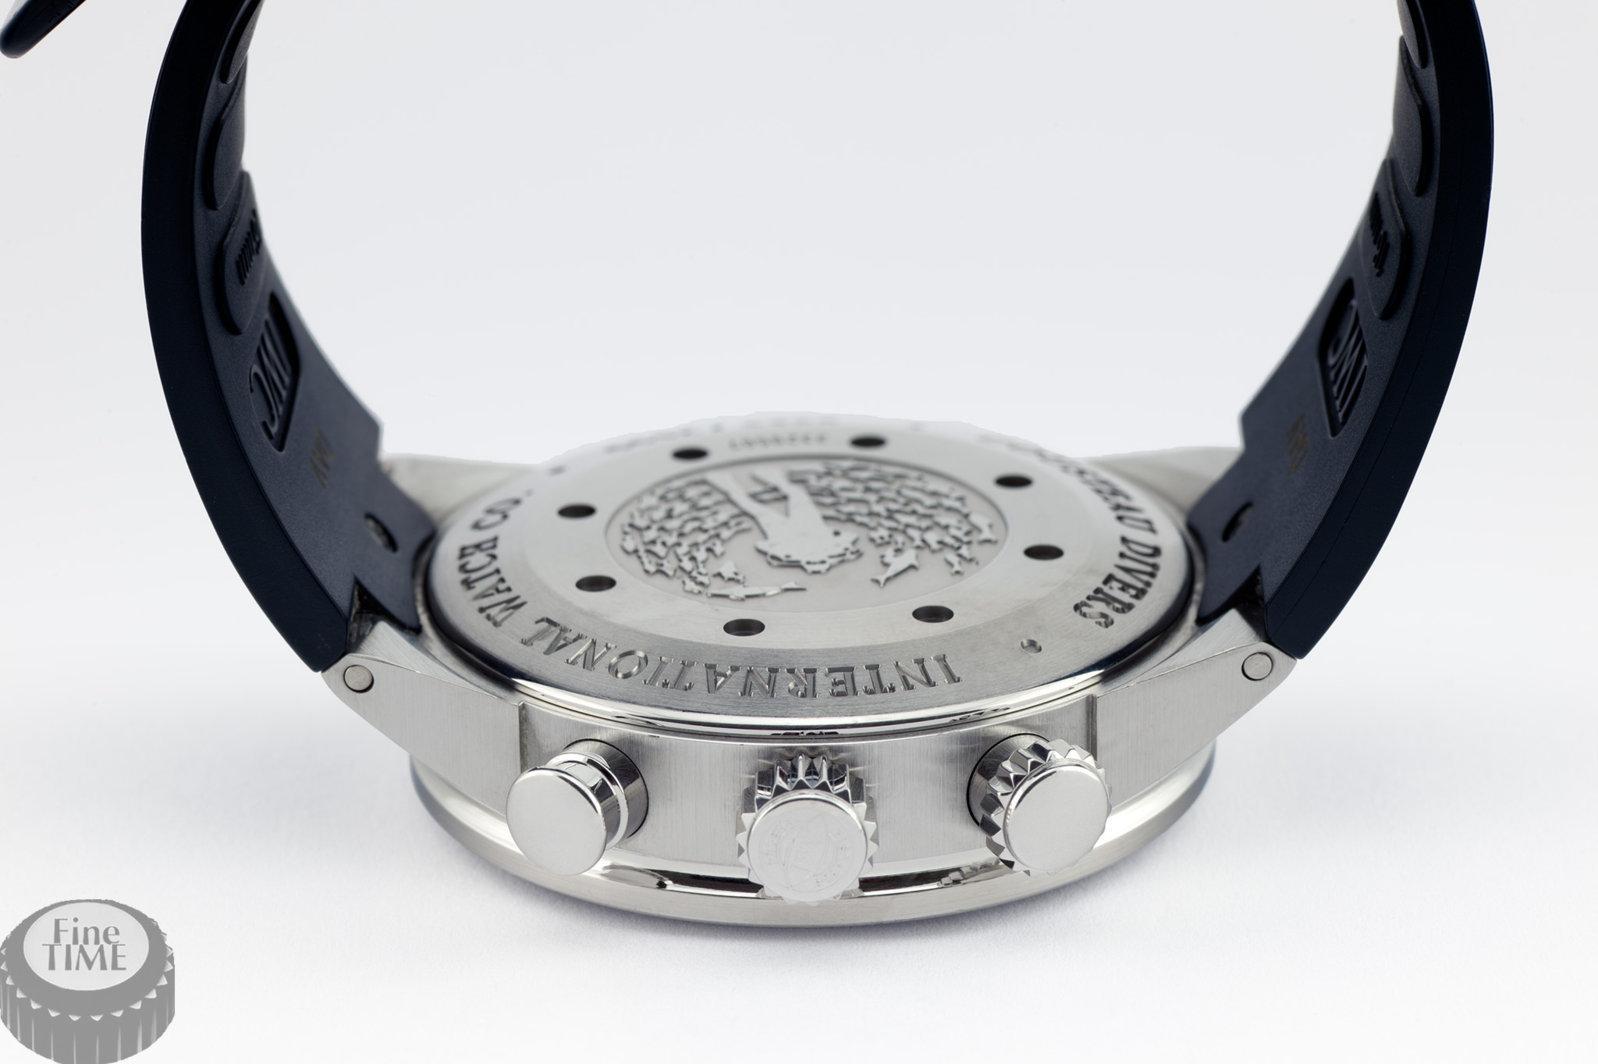 iwc-aquatimer-chronograph-cousteau-divers-iw378101-05.jpg